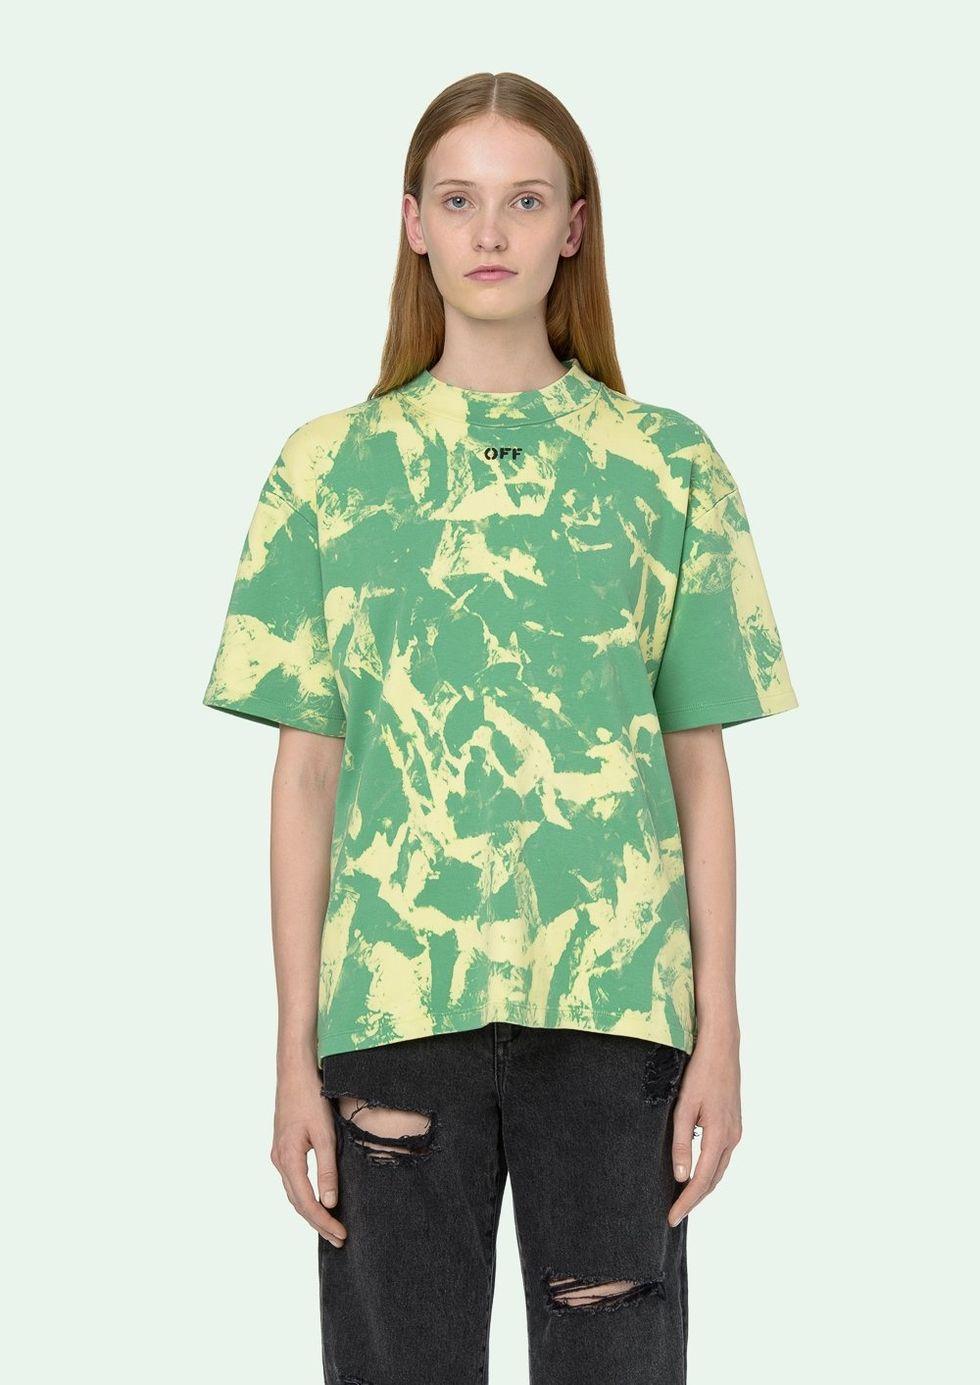 camisetas viralizar look instagram OFF WHITE